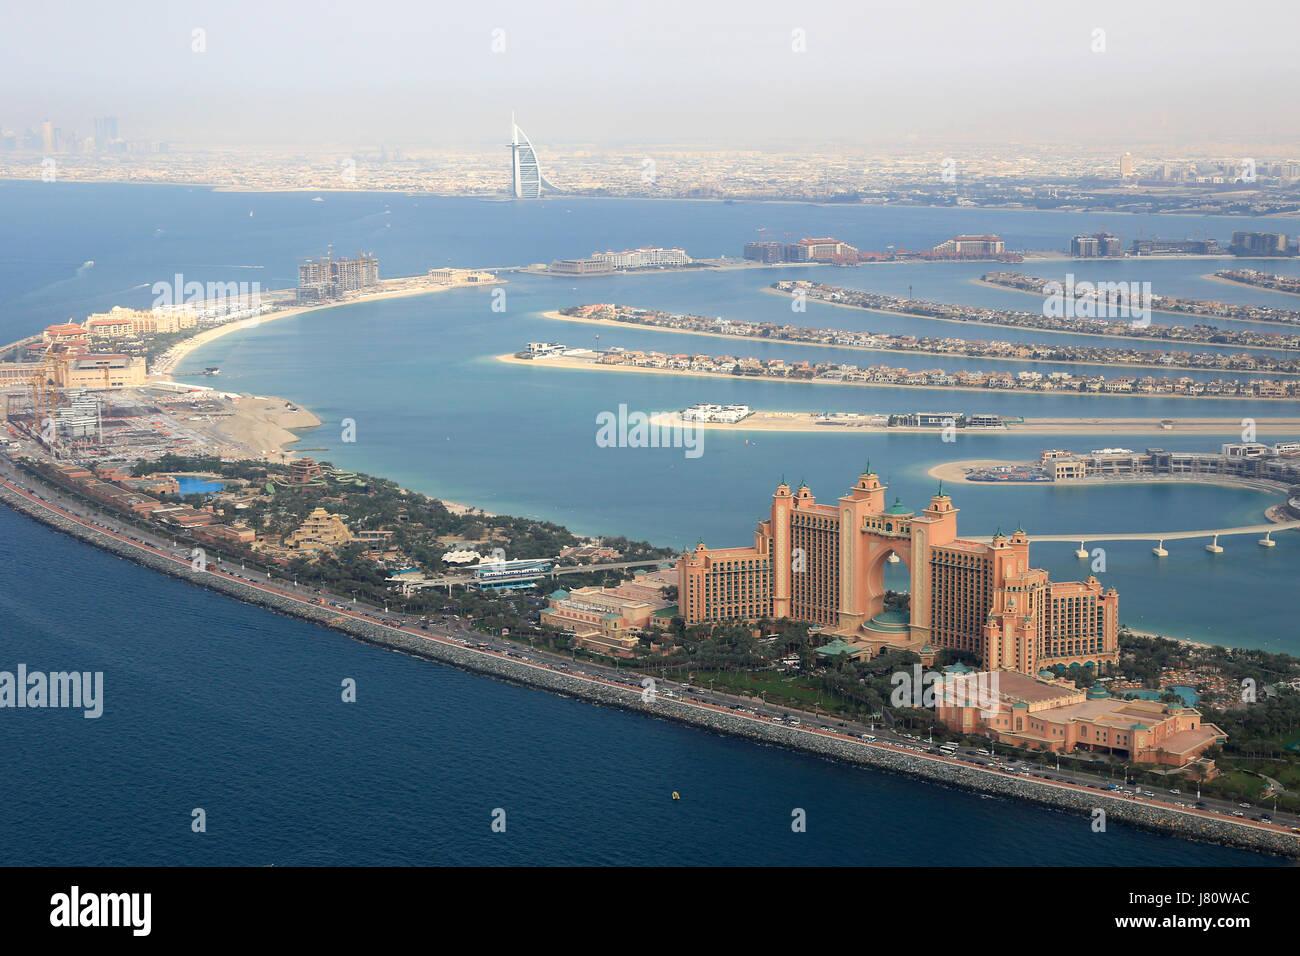 El Dubai Palm Island Atlantis Hotel Burj Al Arab vista aérea fotografía EAU Imagen De Stock